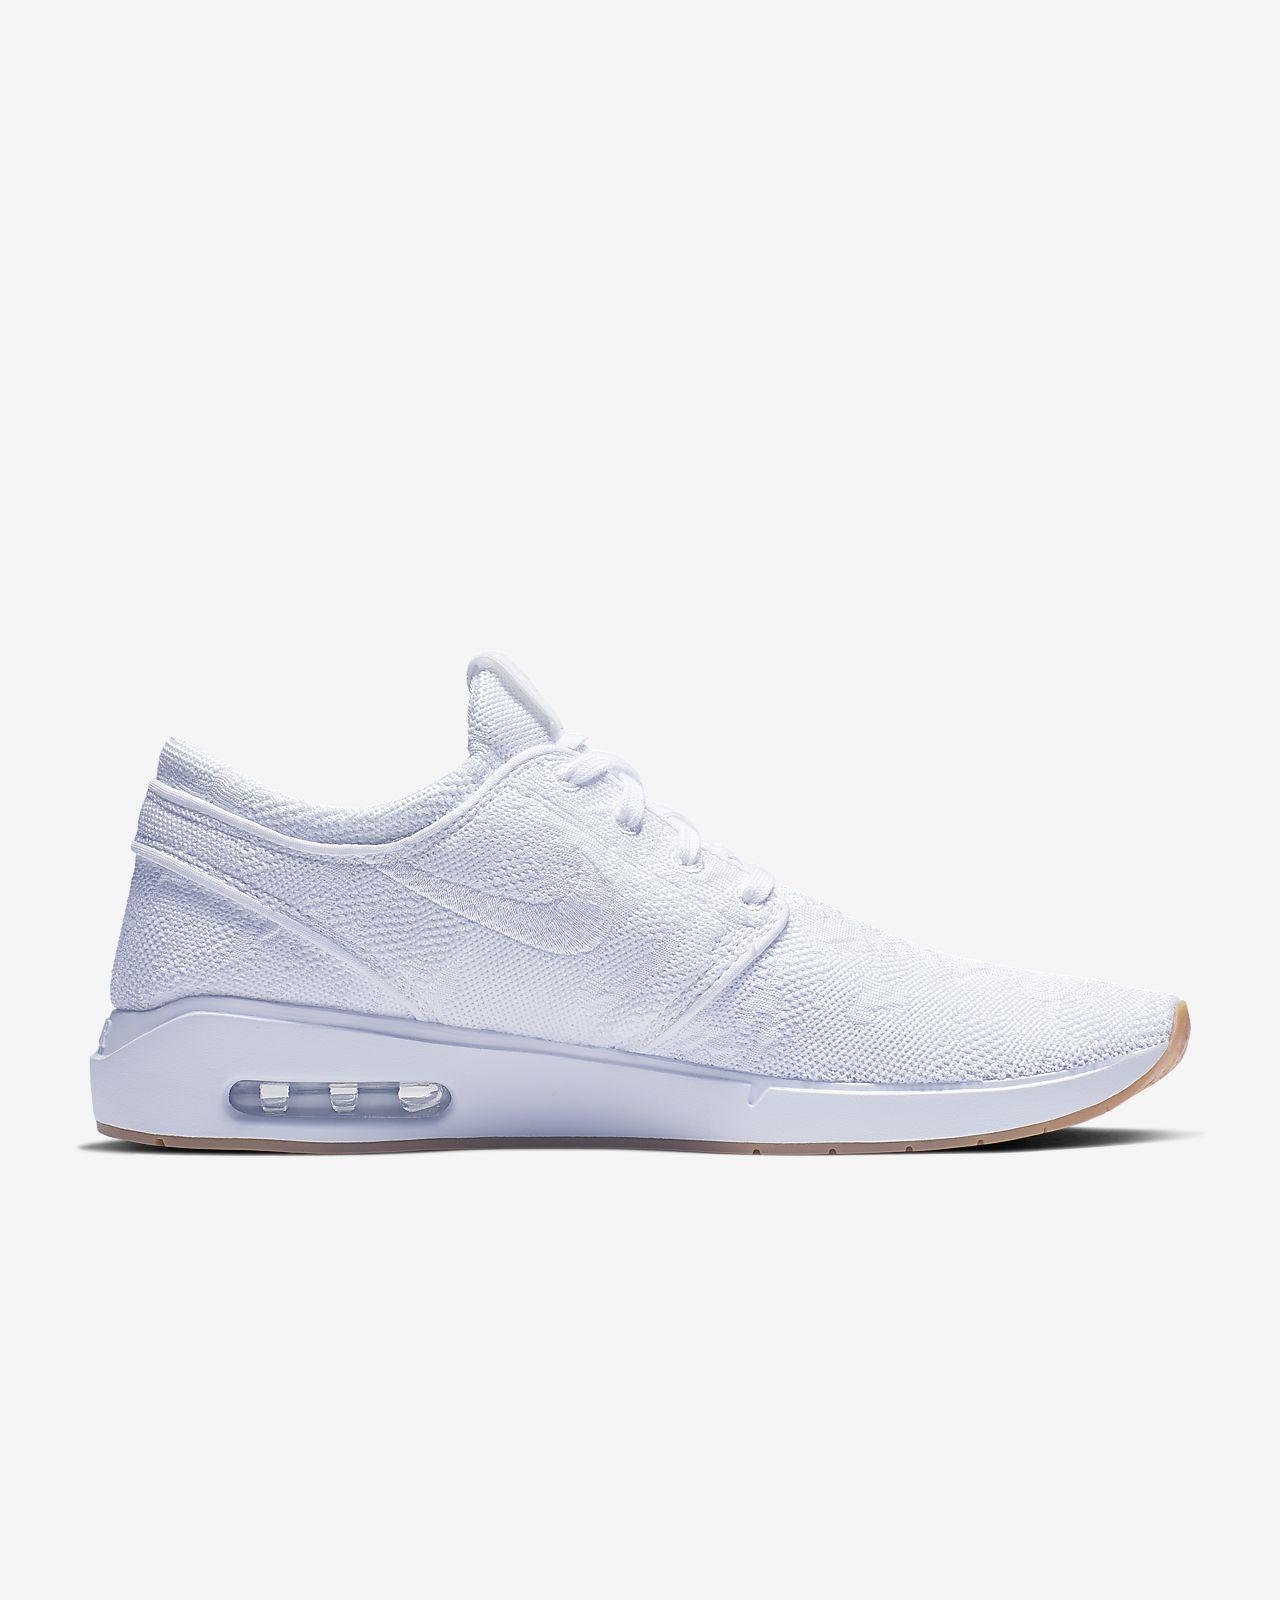 info for bd865 64959 ... Skateboardsko Nike SB Air Max Janoski 2 för män